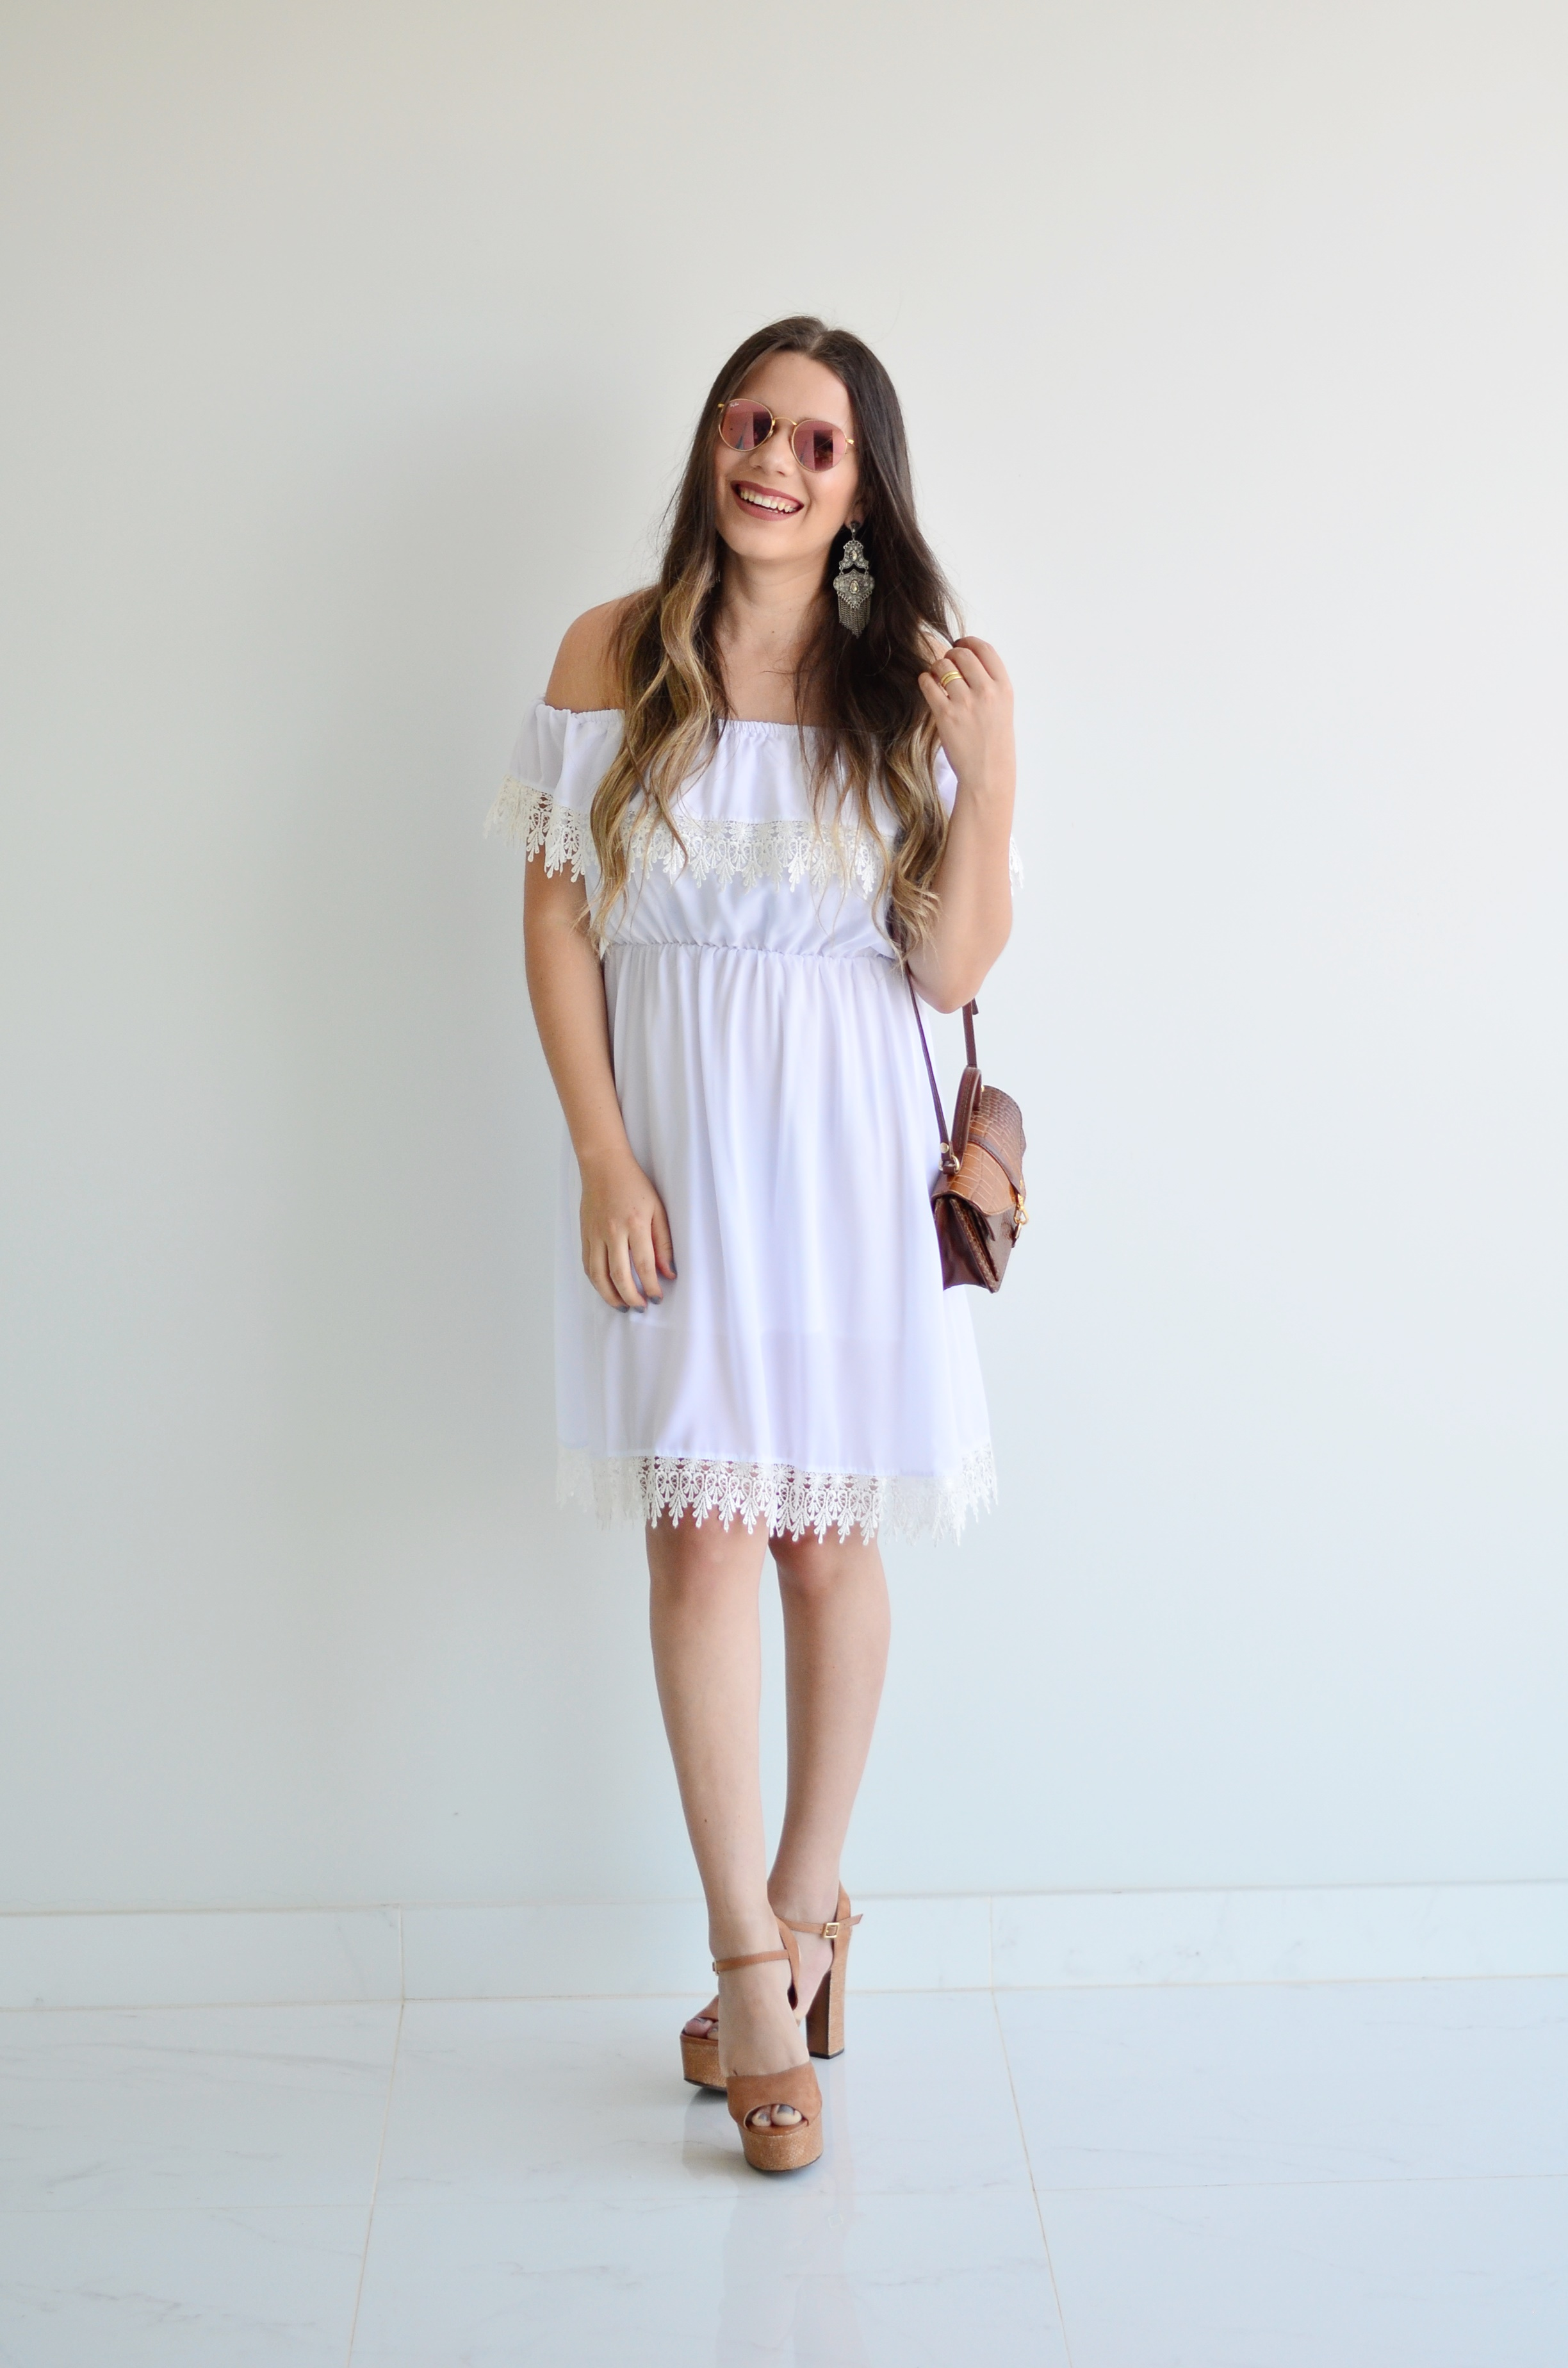 look-duplo-vestido-e-conjunto-branco-mini-bag-ft-alice-vivianny-7